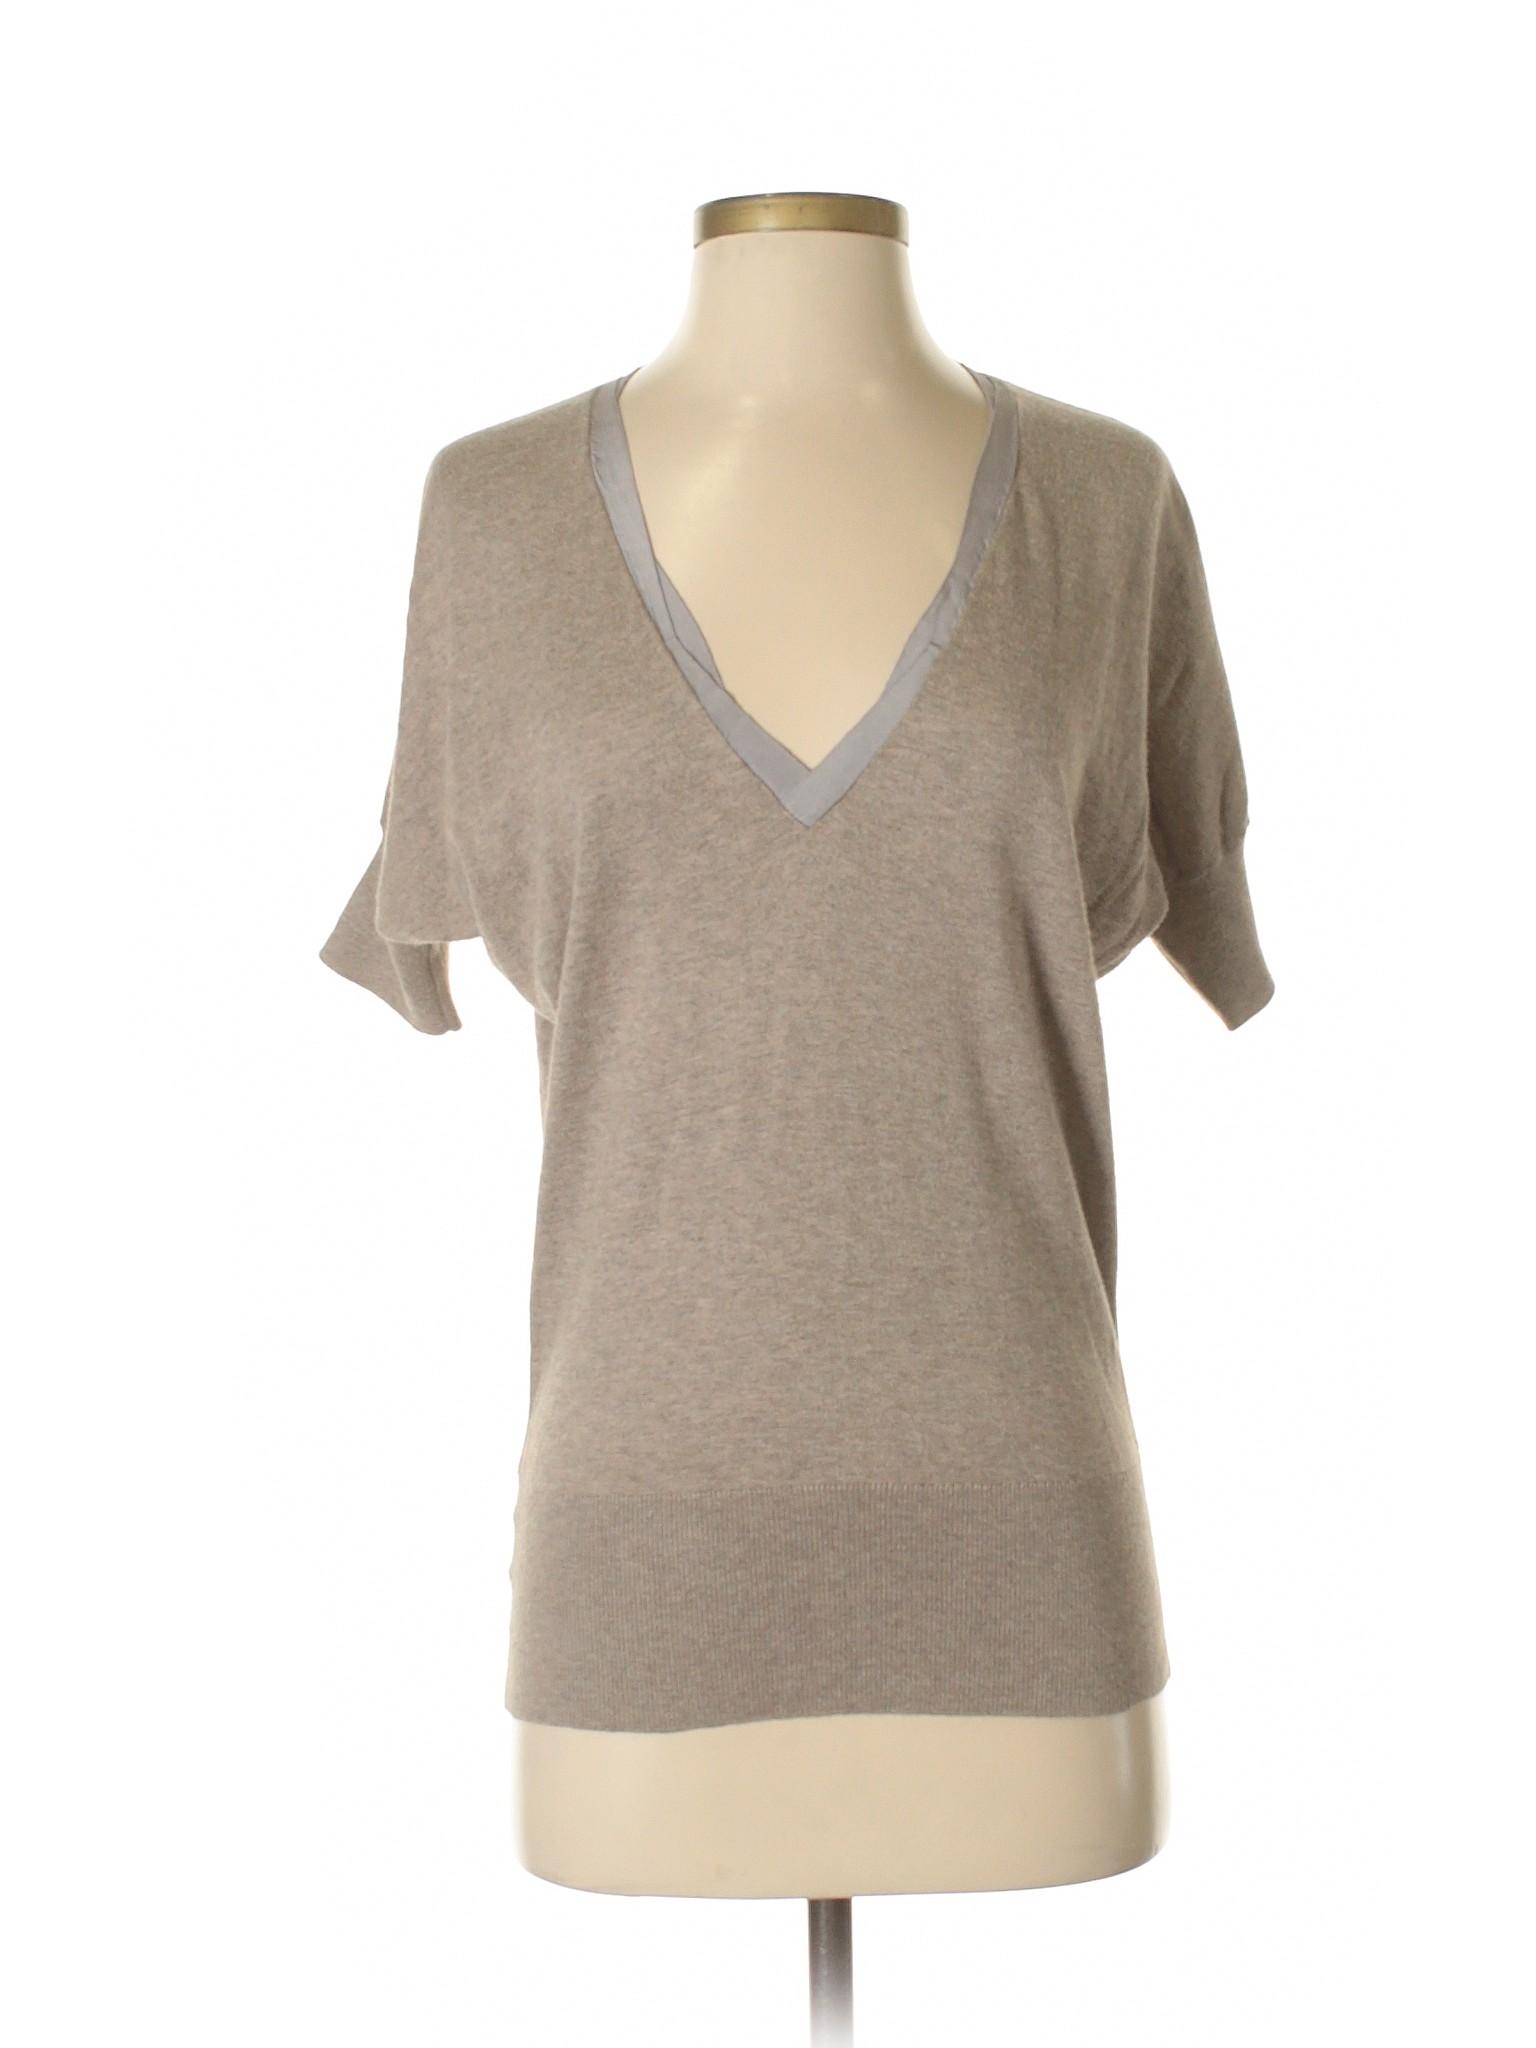 LOFT Pullover Ann Boutique Sweater winter Taylor qx4wUtz